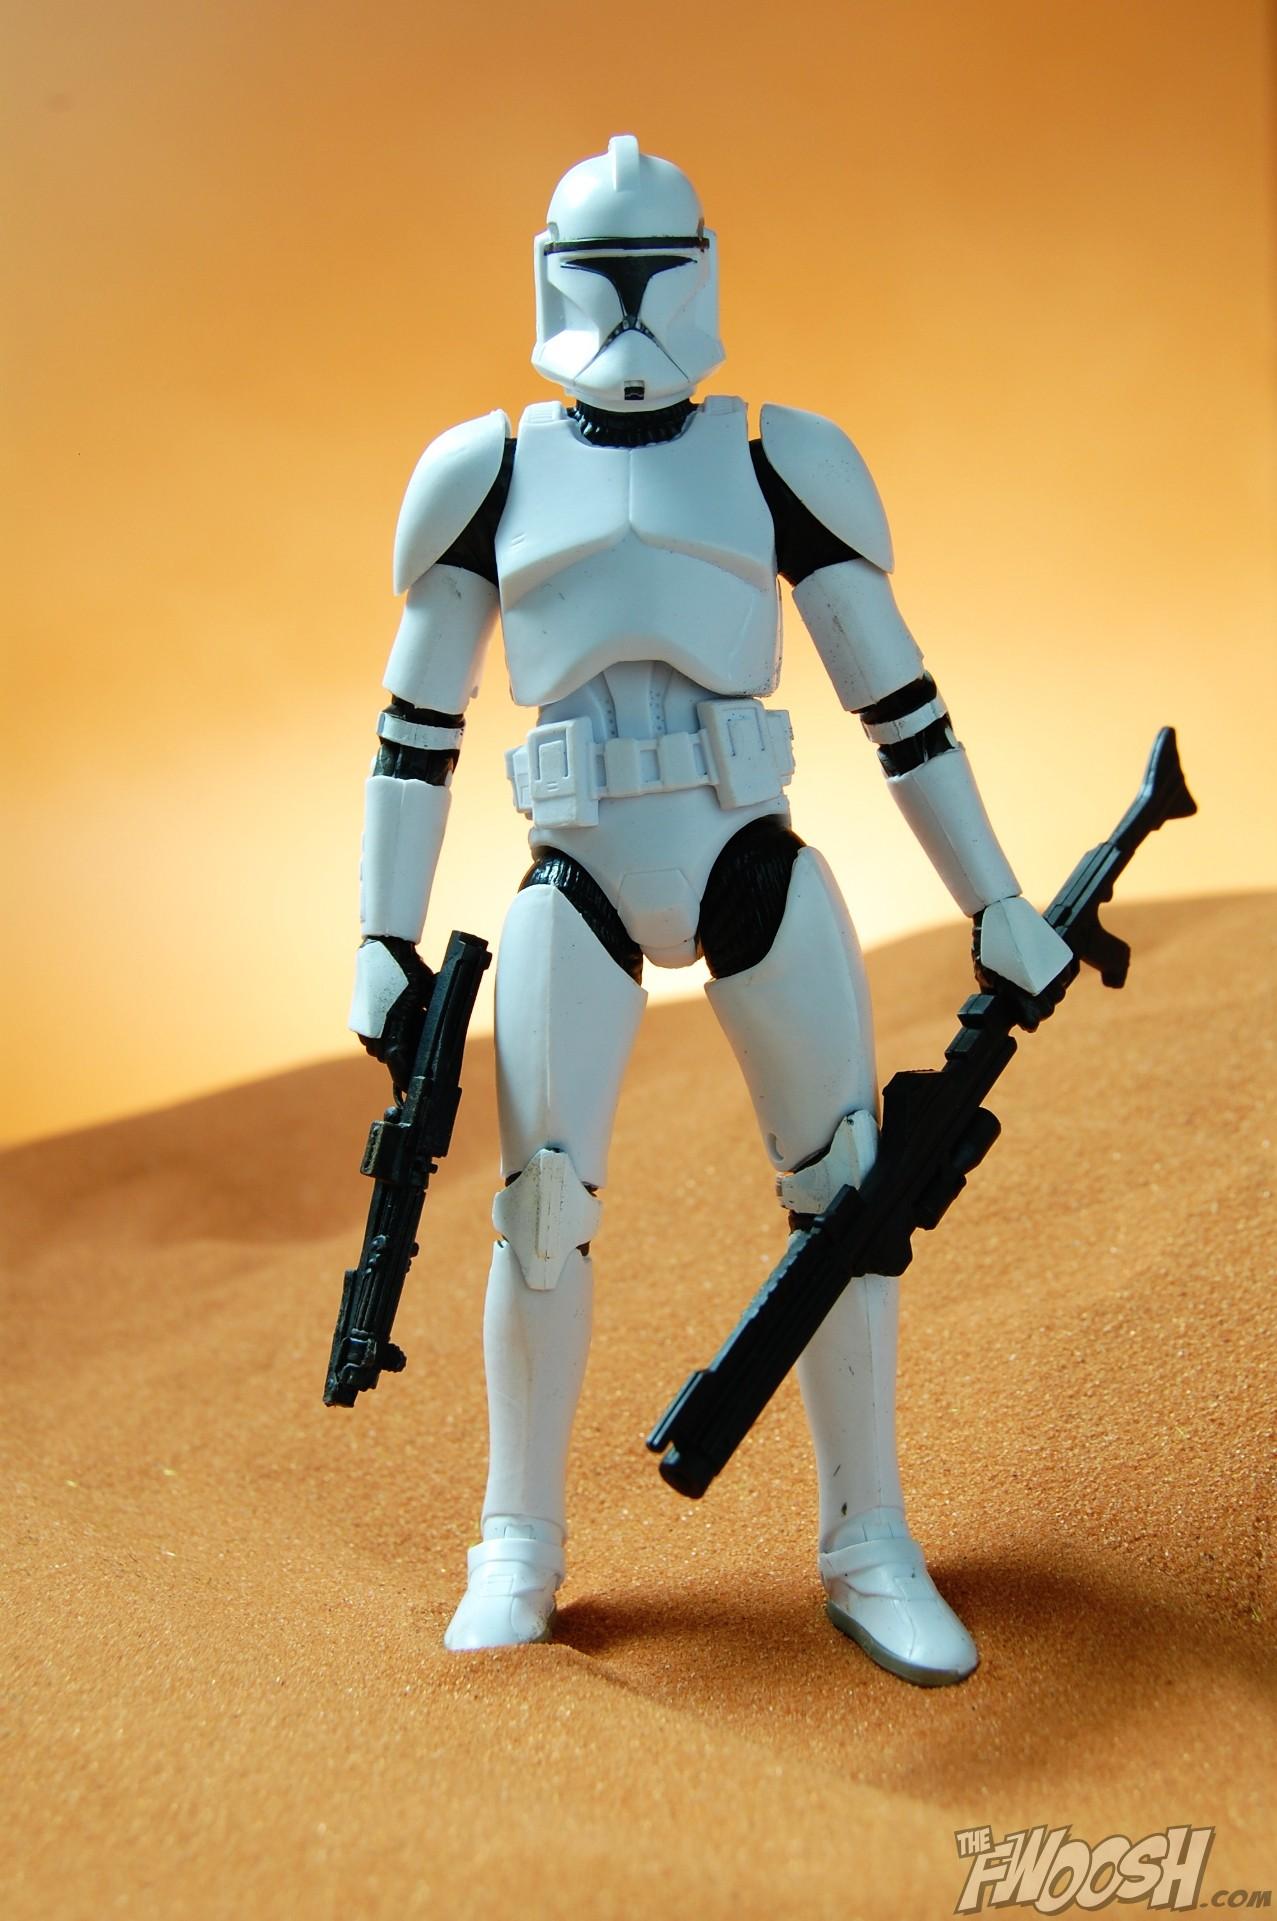 Hasbro Star Wars Black Series Anakin Skywalker and Clone